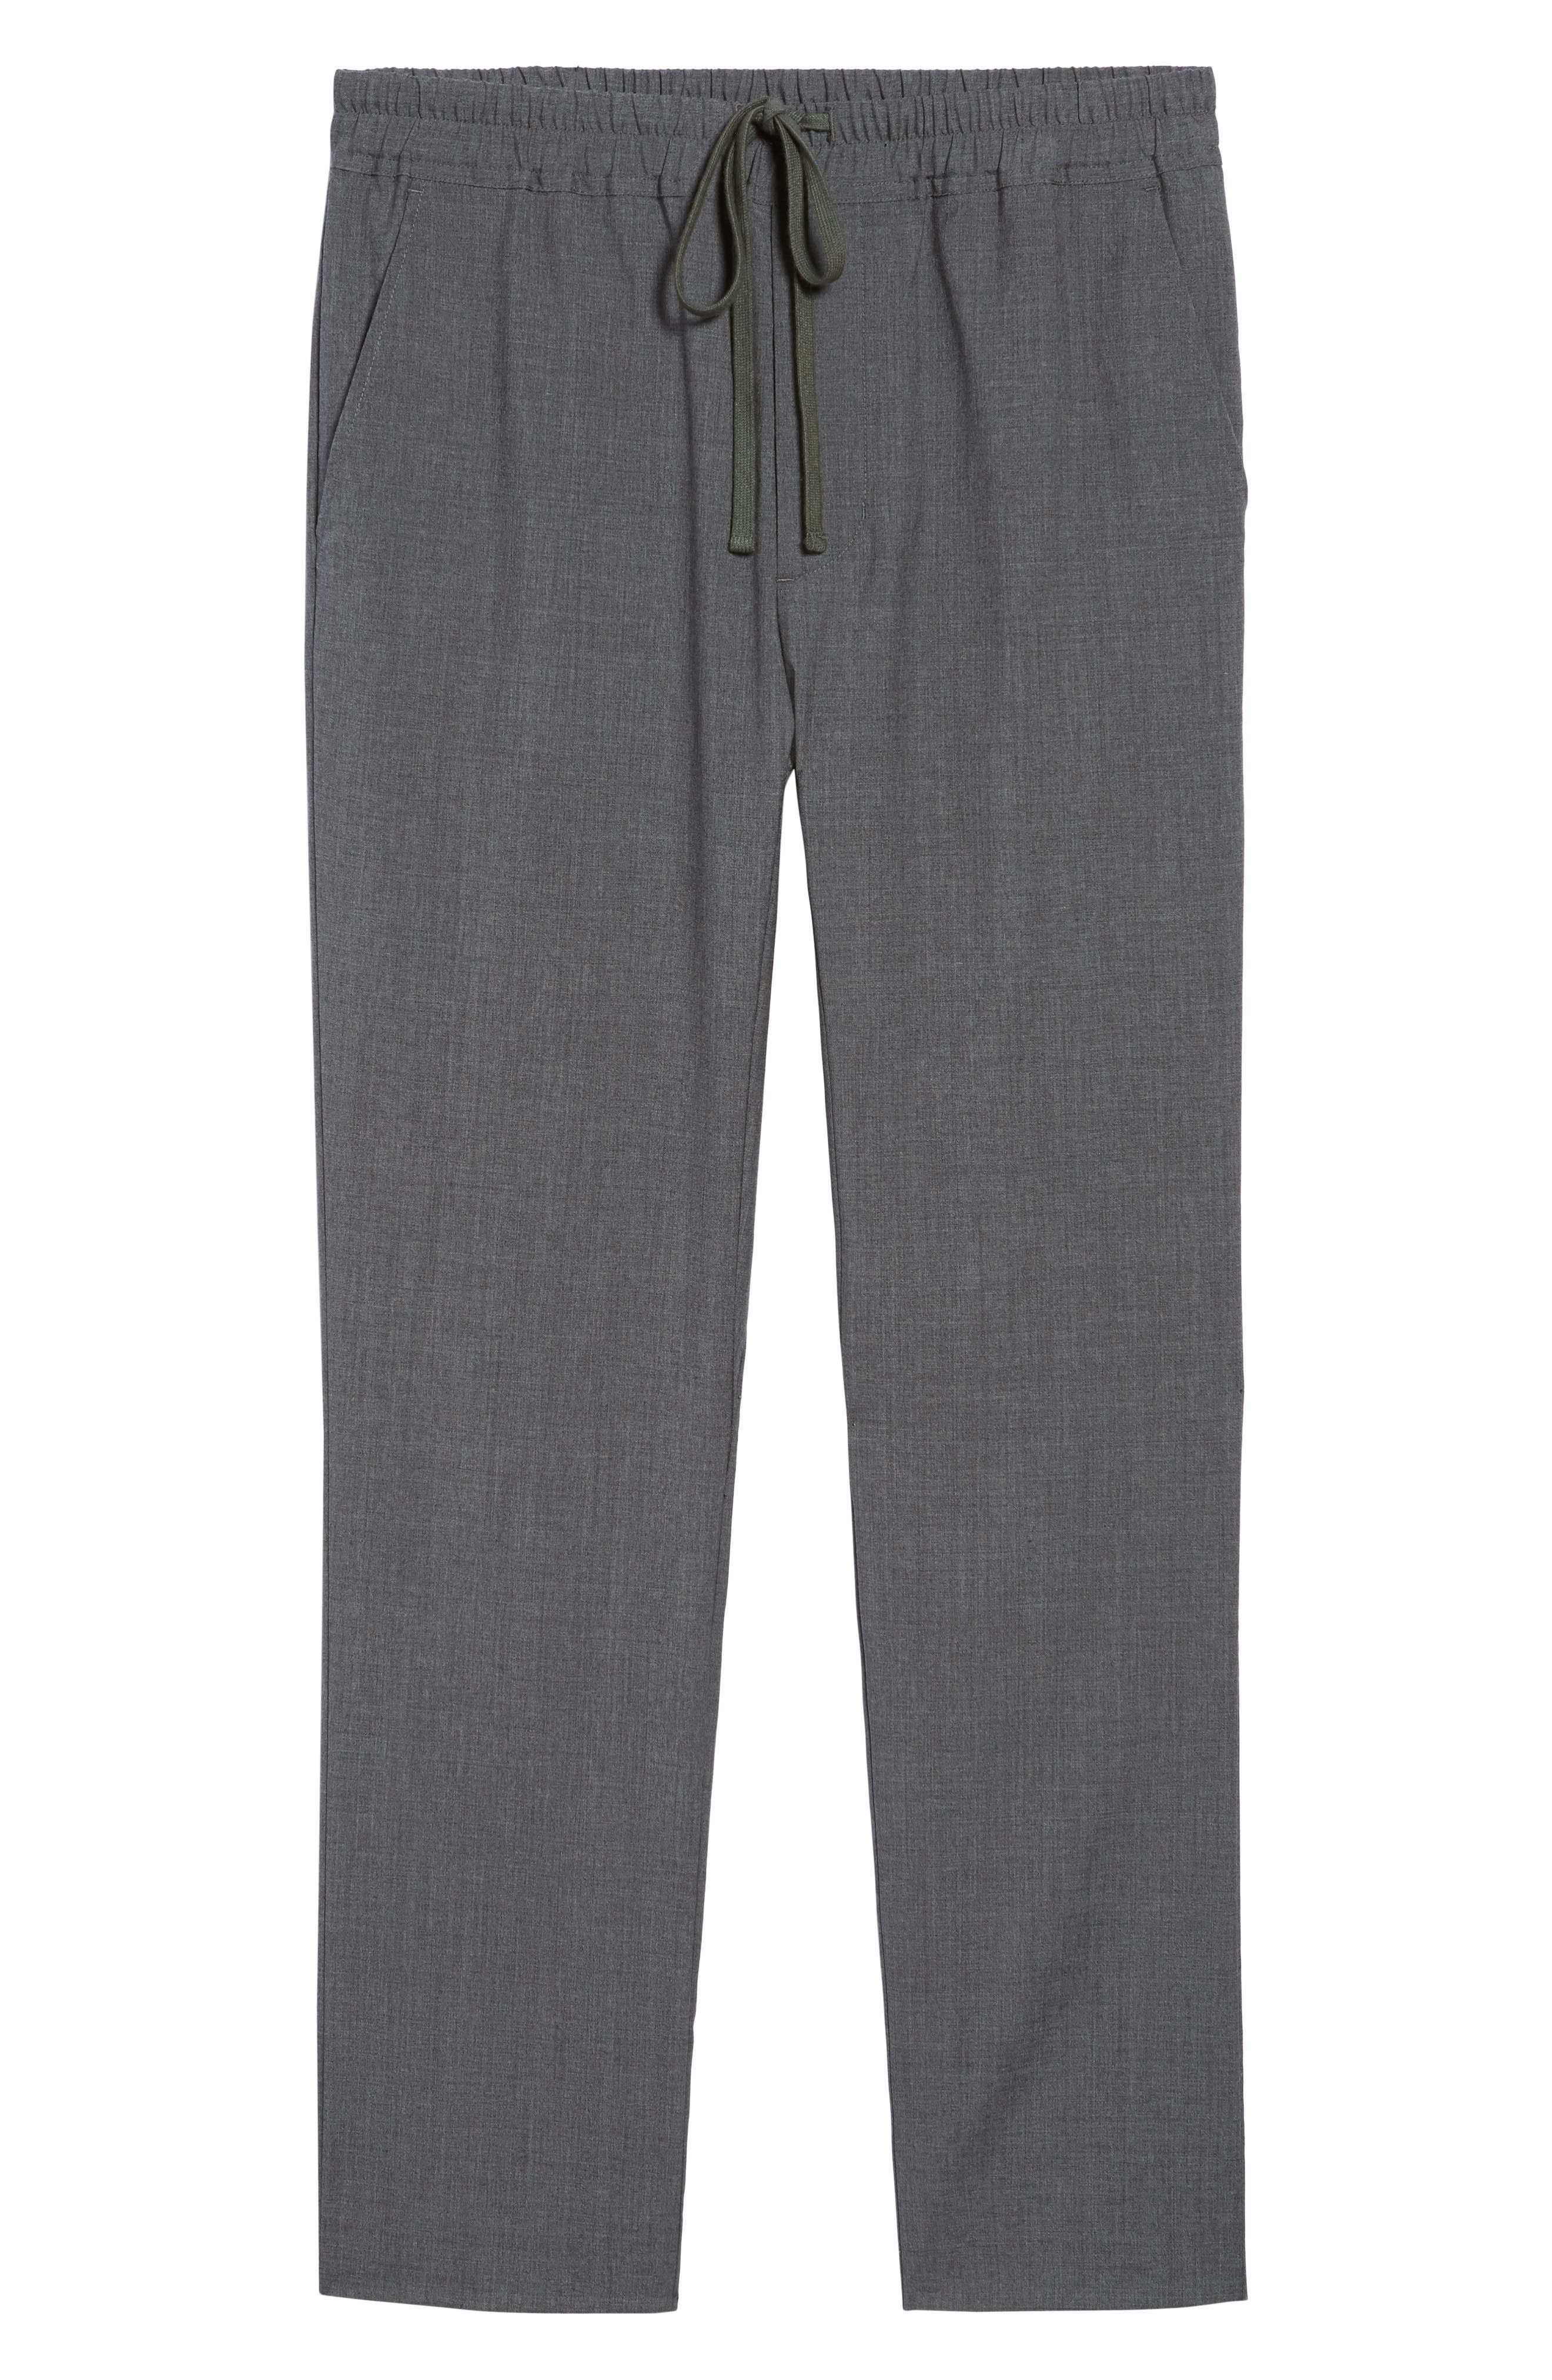 Slim Fit Five-Pocket Pants,                             Alternate thumbnail 6, color,                             Charcoal